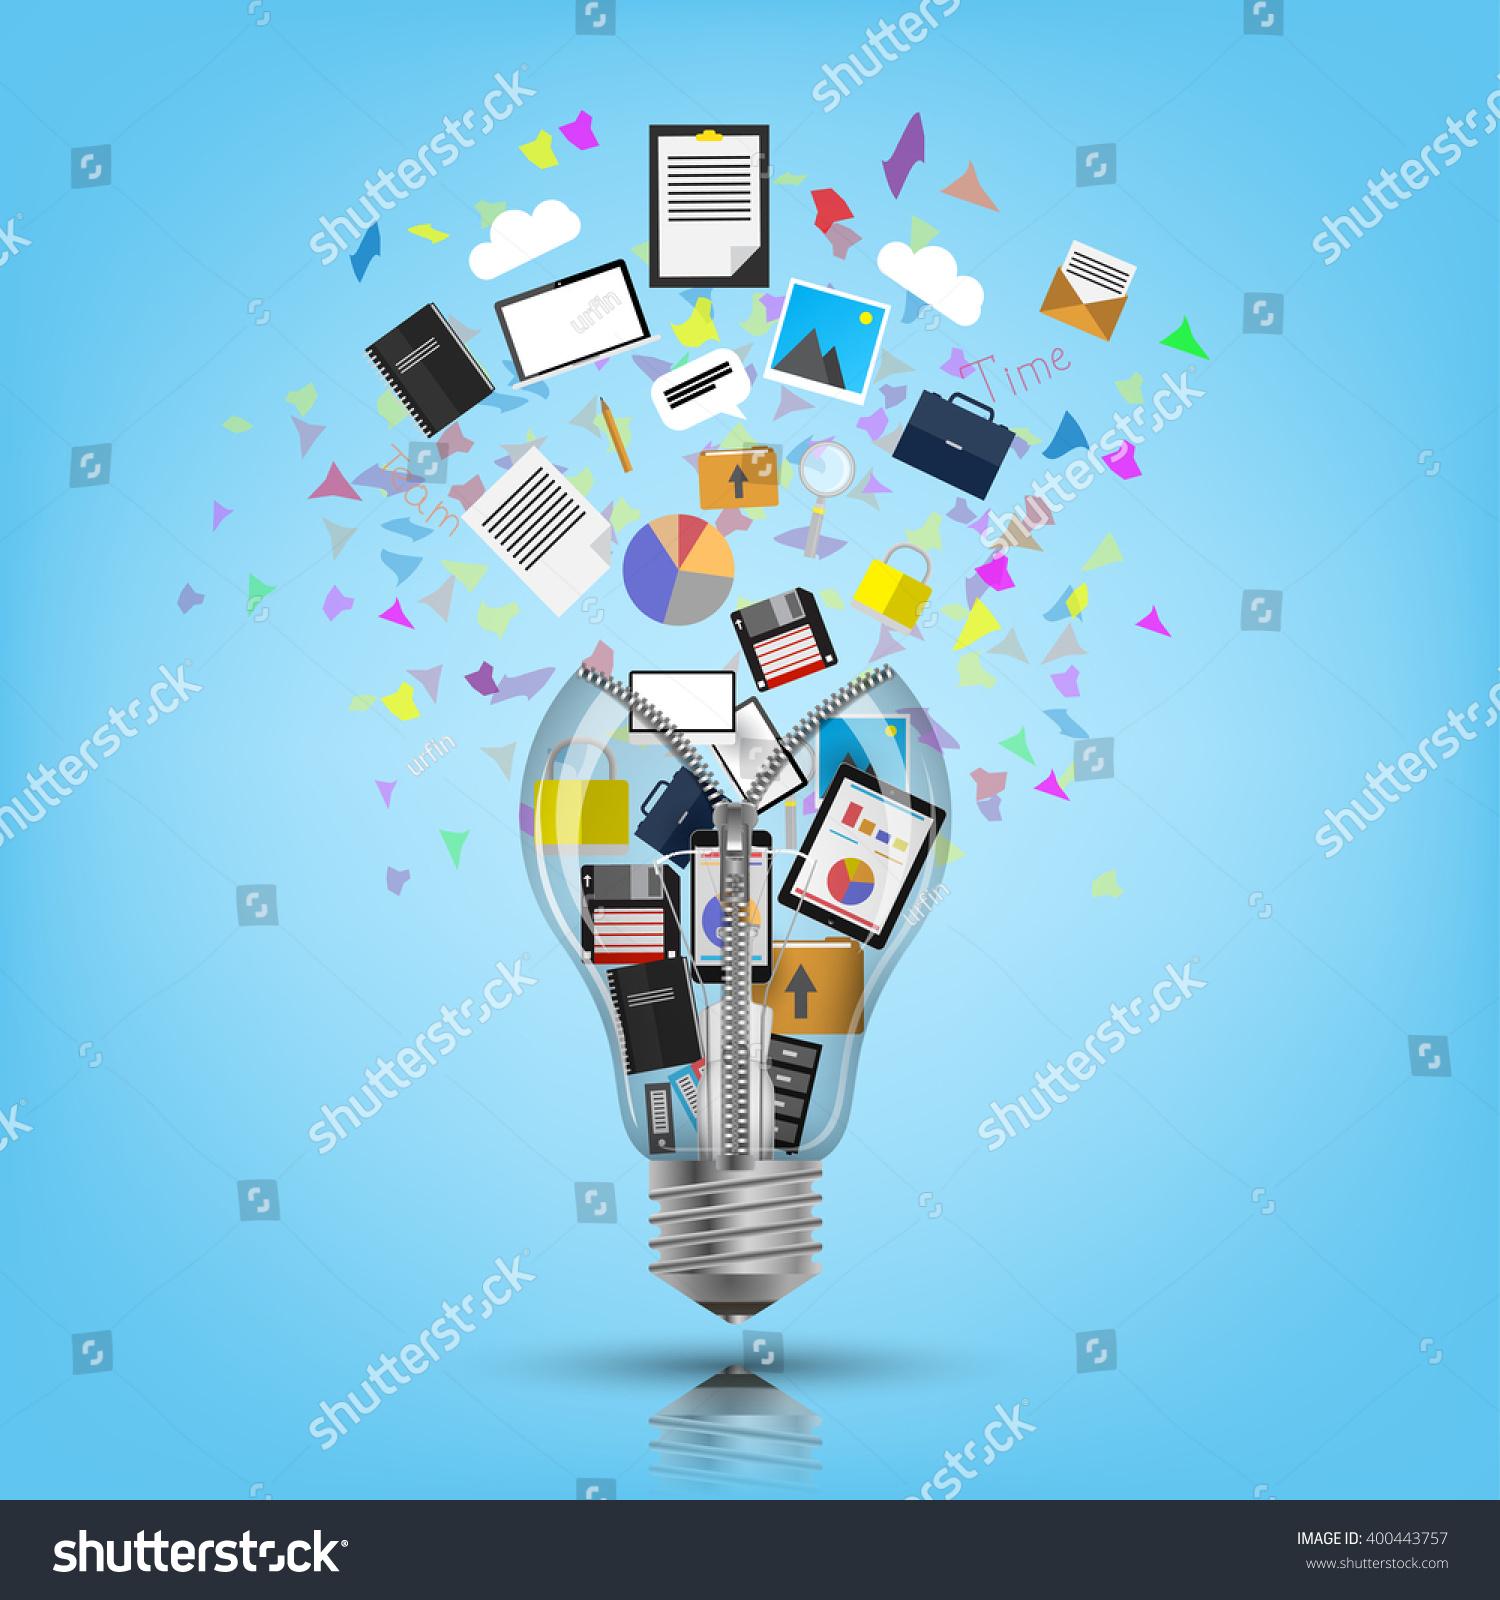 Light Bulb Bursting Icons Ideas Stock Vector (Royalty Free ...